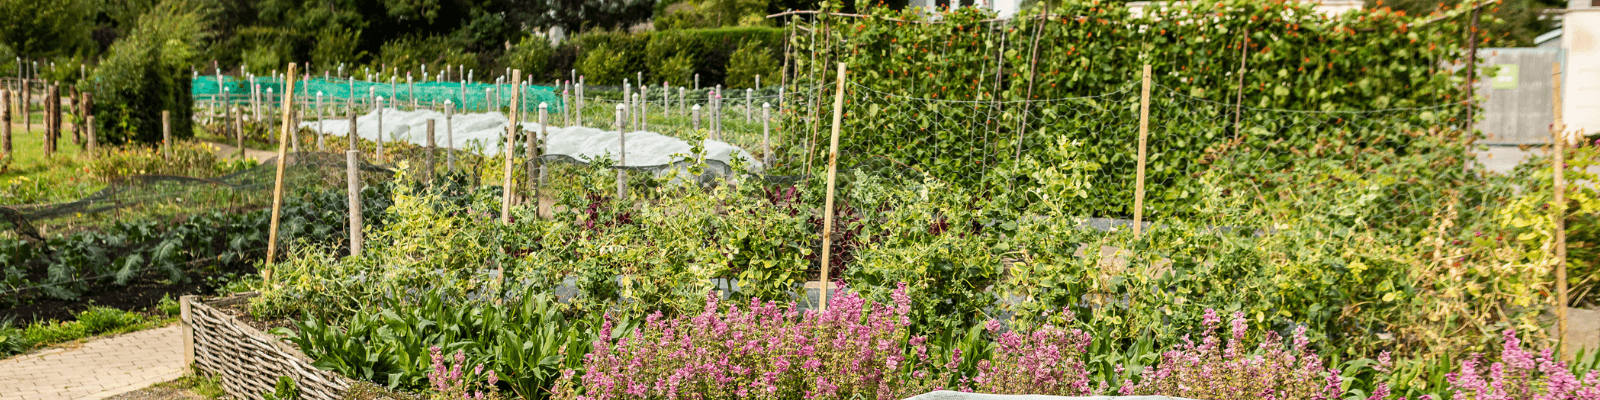 https://www.airfield.ie/wp-content/uploads/2020/10/Organic-Food-Garden-Image-Web-Header-1.png